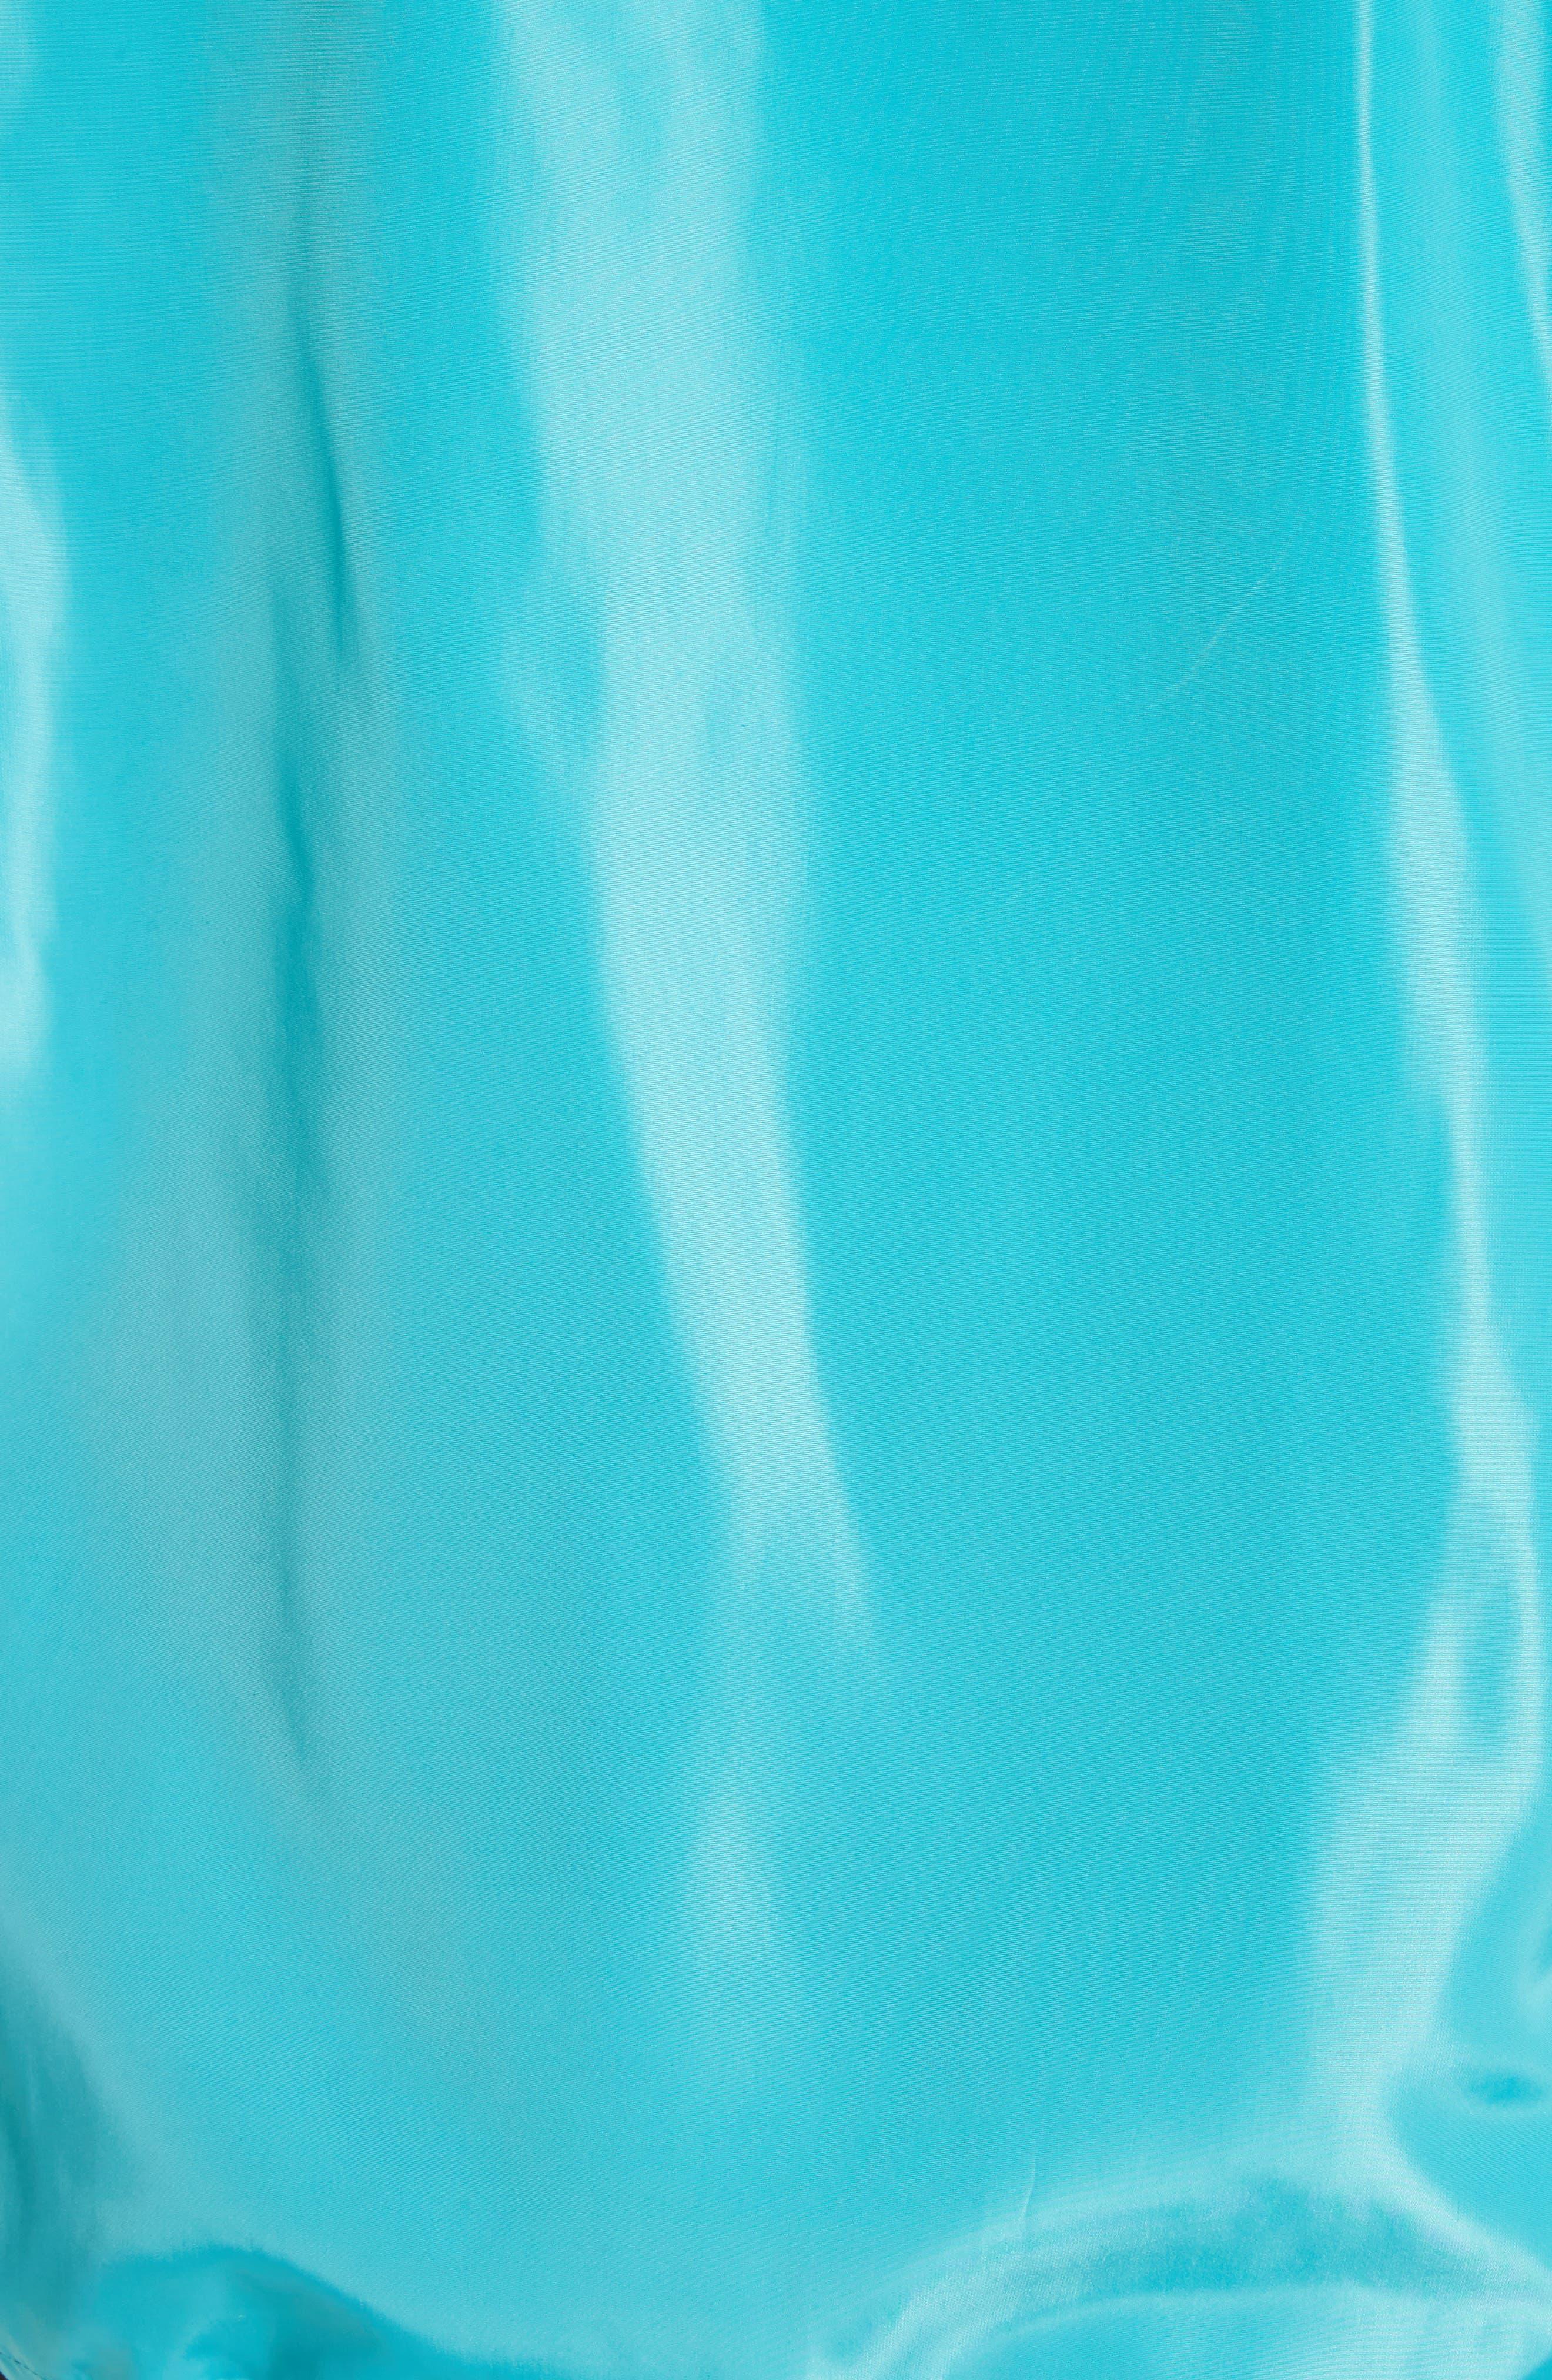 Parli Inglese Coach Jacket,                             Alternate thumbnail 5, color,                             Turquoise